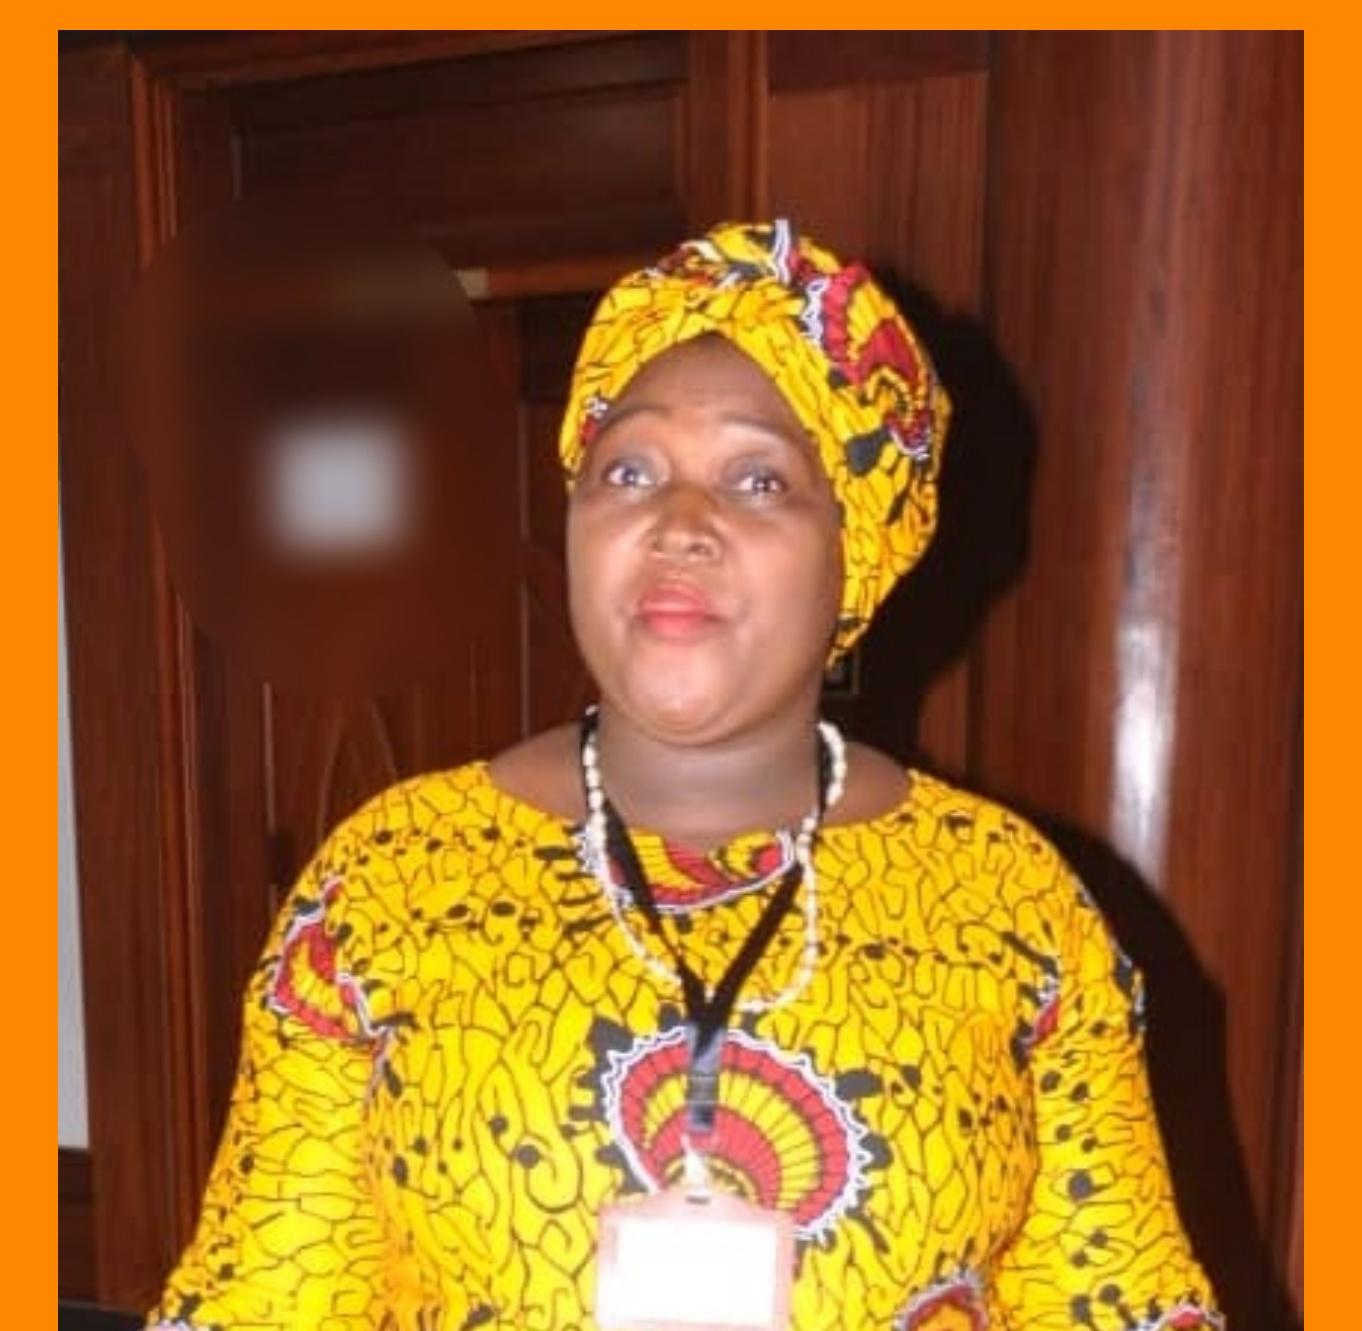 Ms. Ntombikayise Fakudze